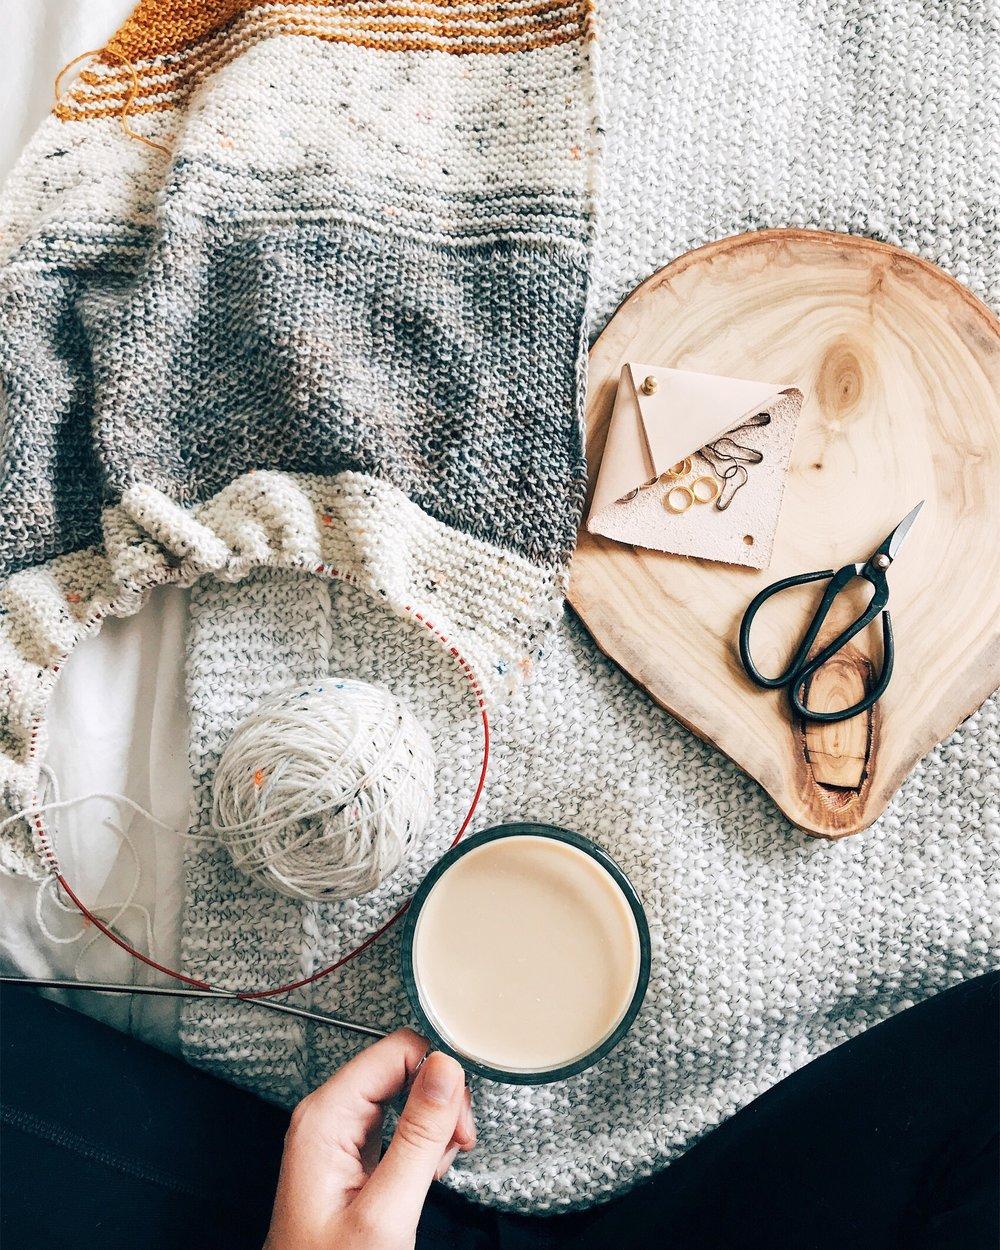 Yarn : Madelinetosh TOSH Light in Calligraphy, Gold Rush, and Modern Fair Isle  Pattern : Sneffels Shawl (original, coming soon!)